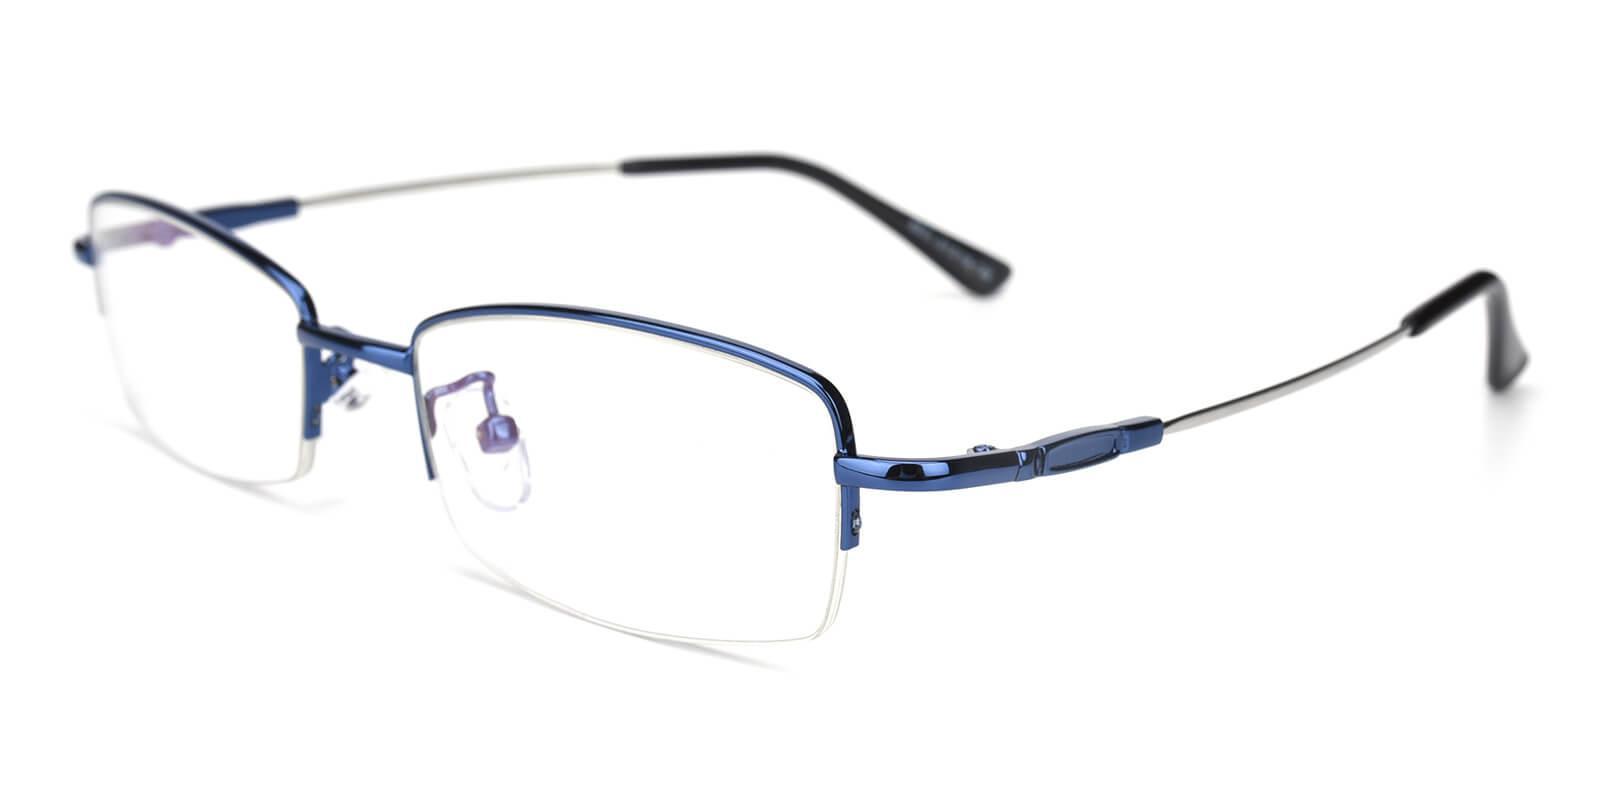 Healdton-Blue-Rectangle-Metal-Eyeglasses-additional1